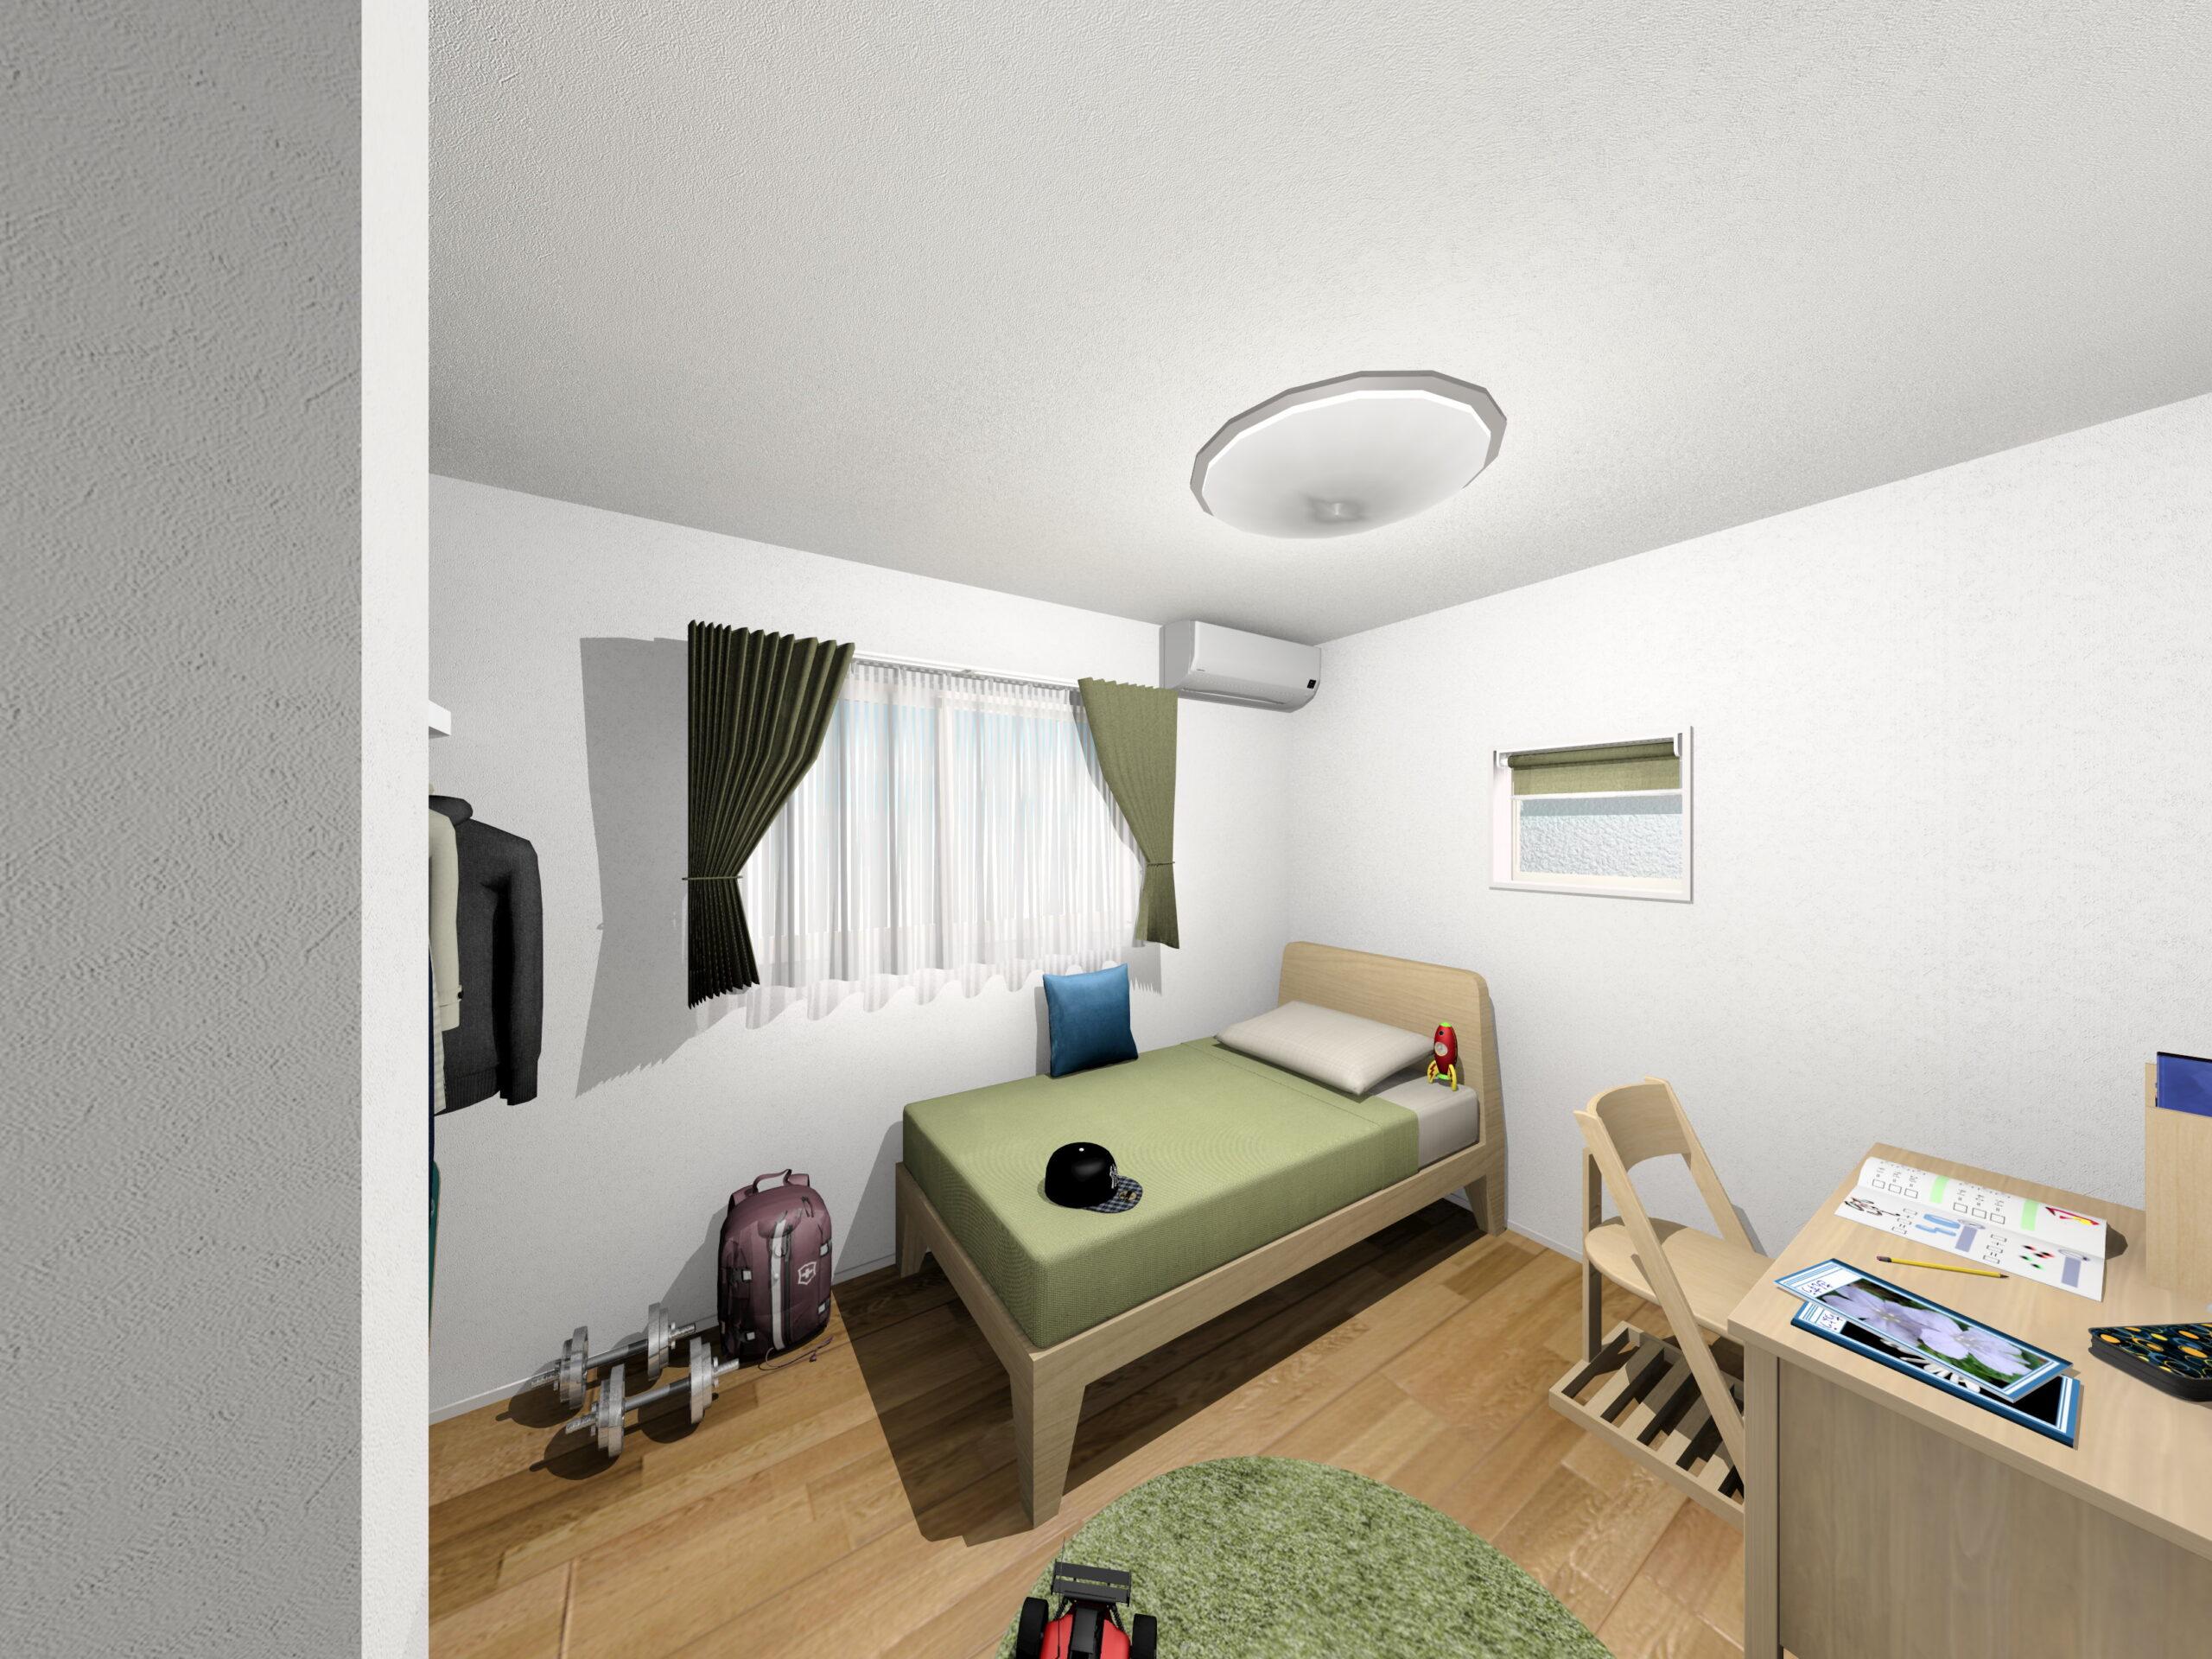 嬉野市新築建売住宅「OURS下宿」4号地洋室パース